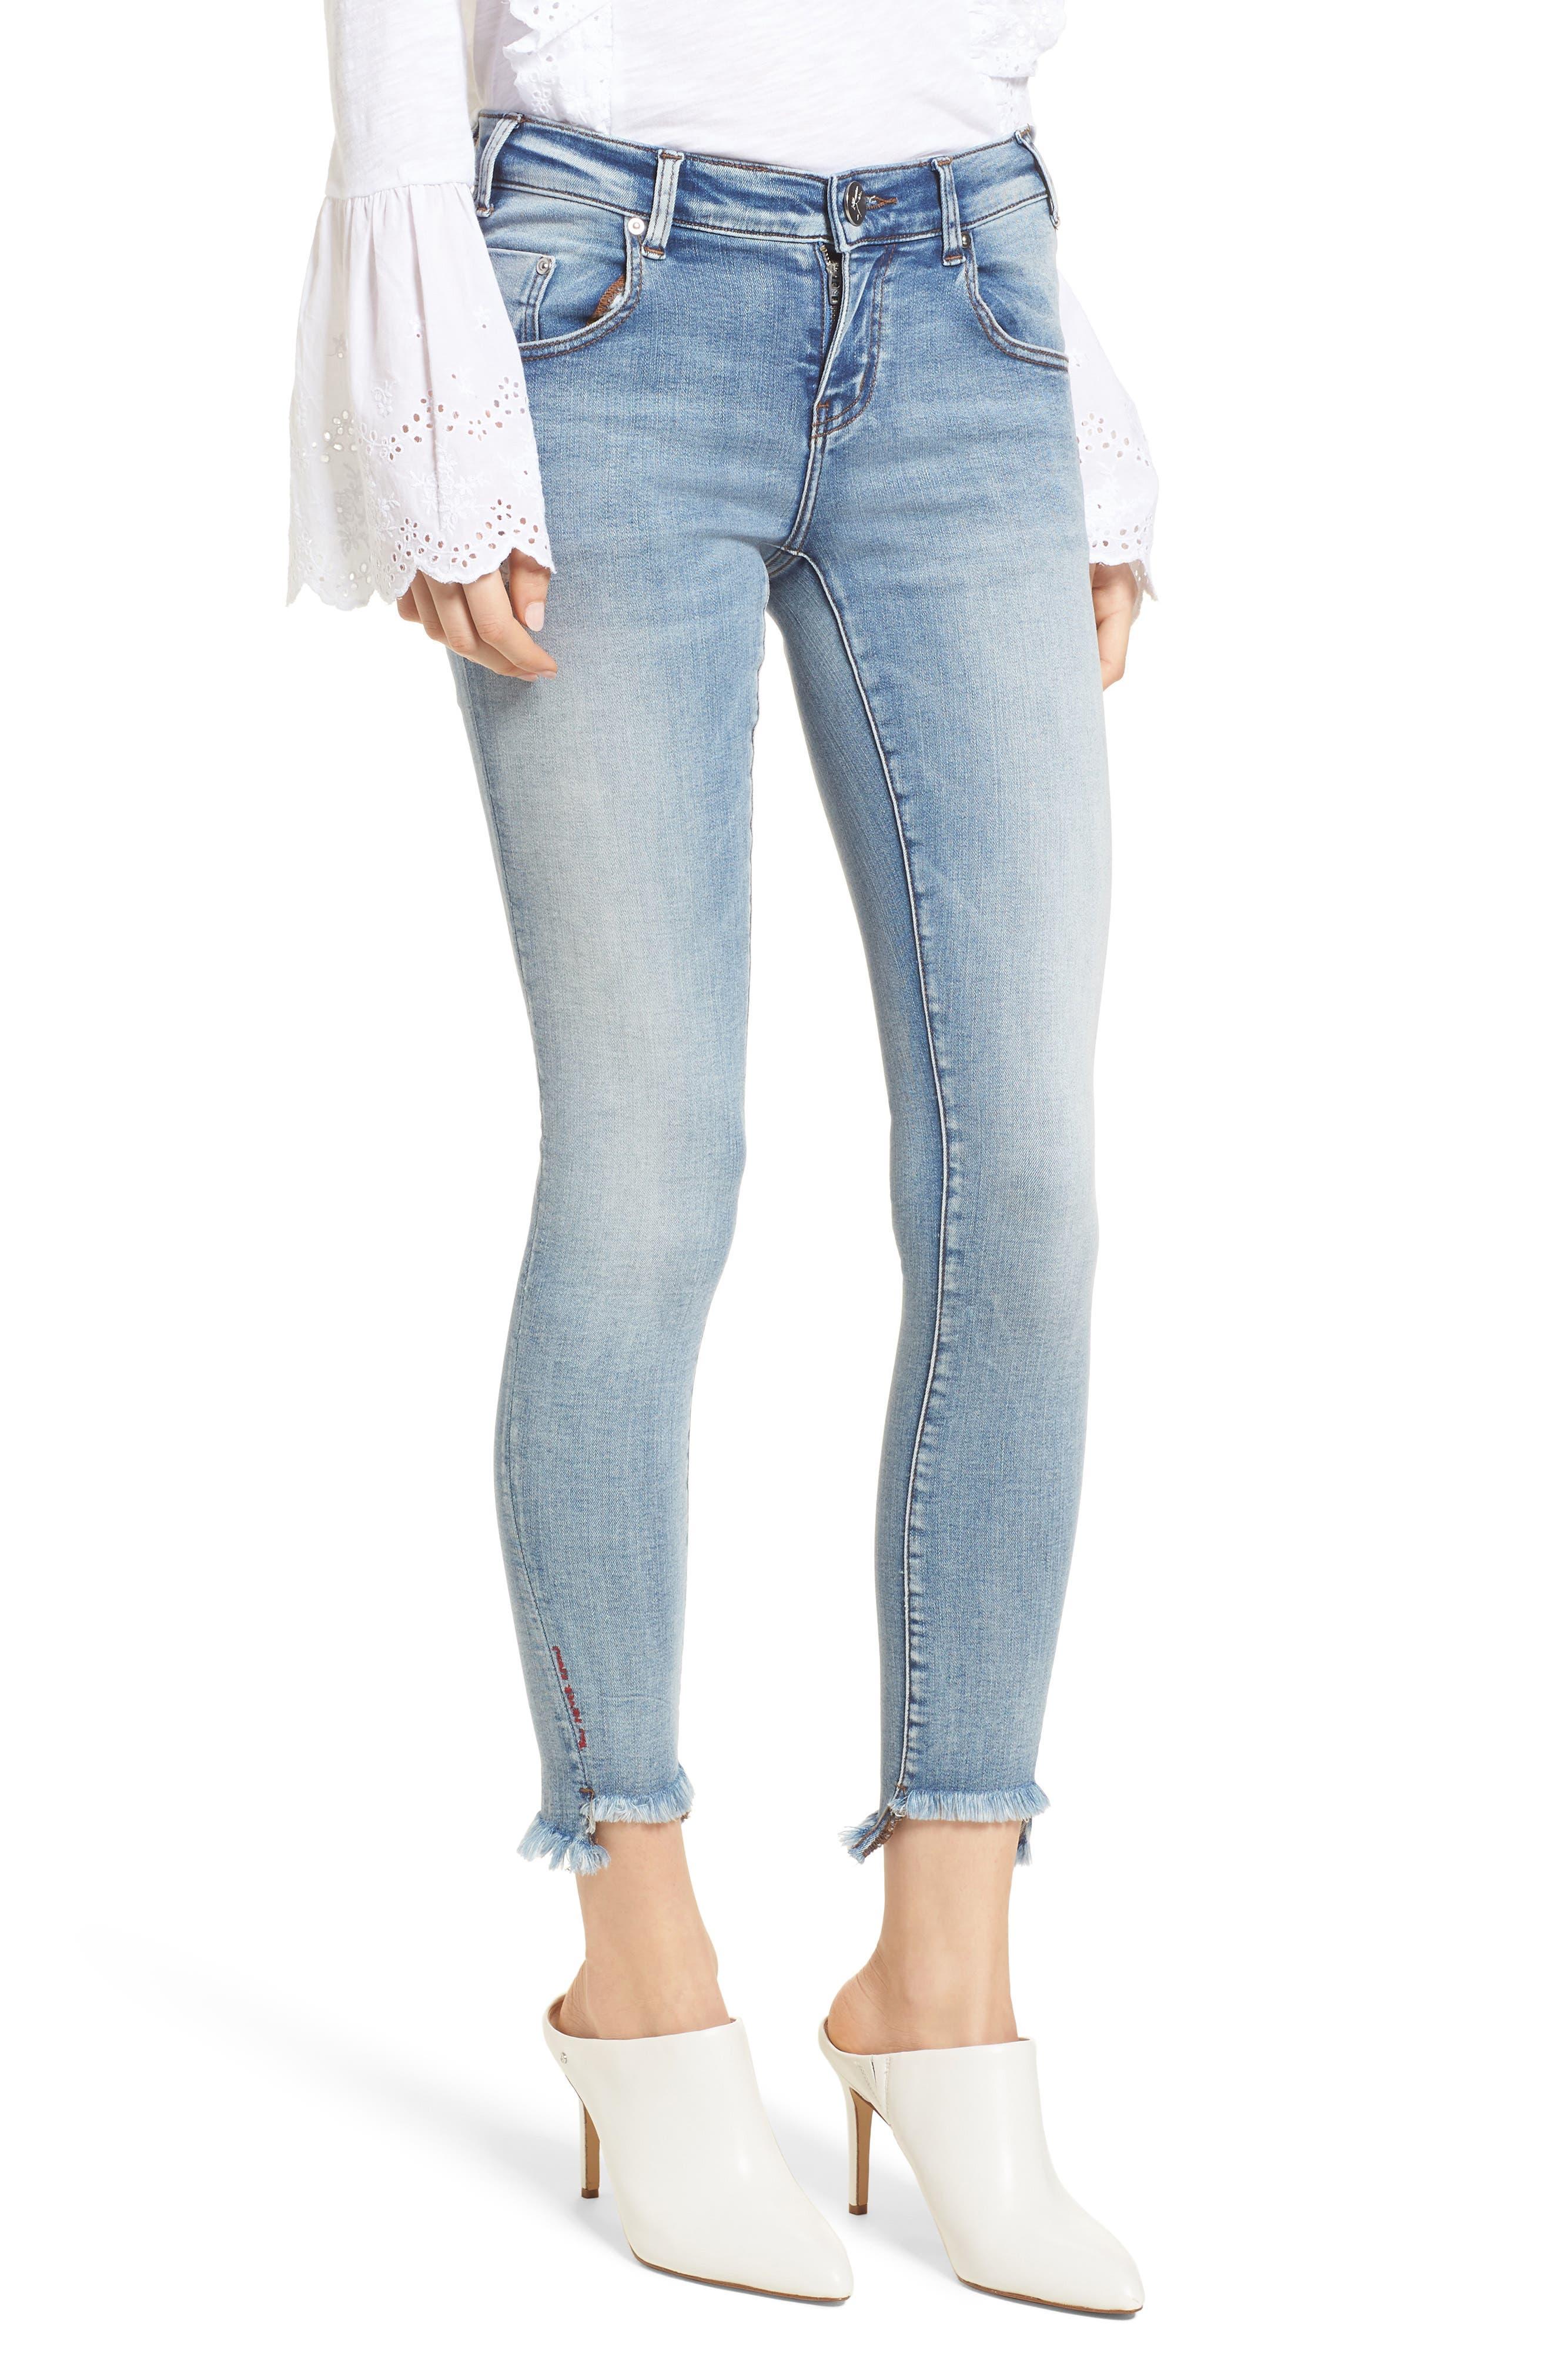 One Teaspoon Freebirds Skinny Jeans (Cobaine)